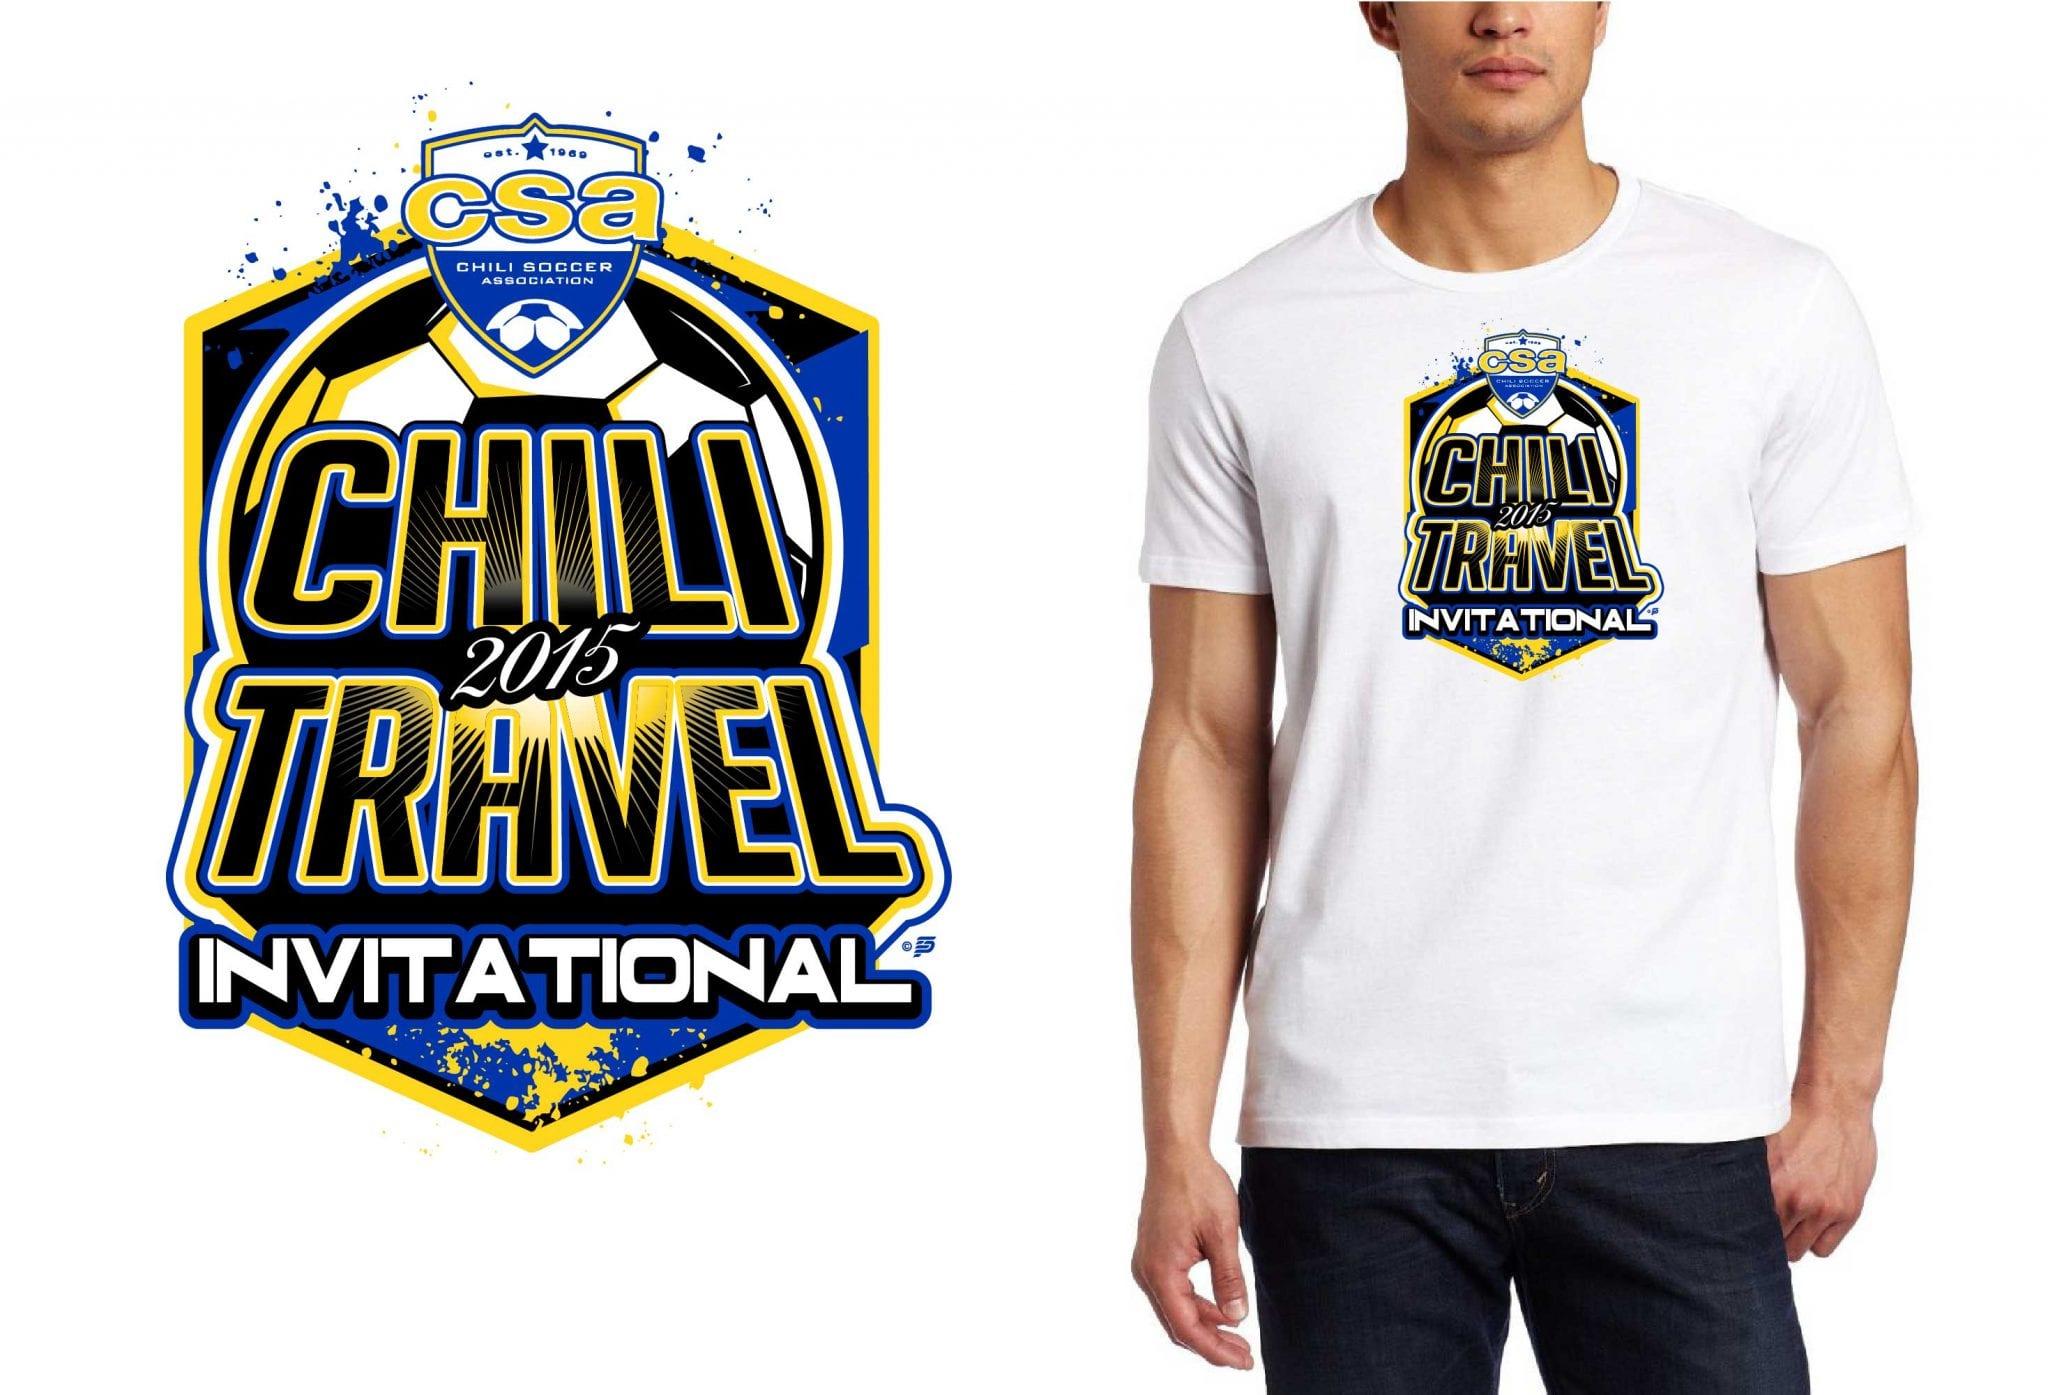 2015 Chili Travel Invitational PRINT READY